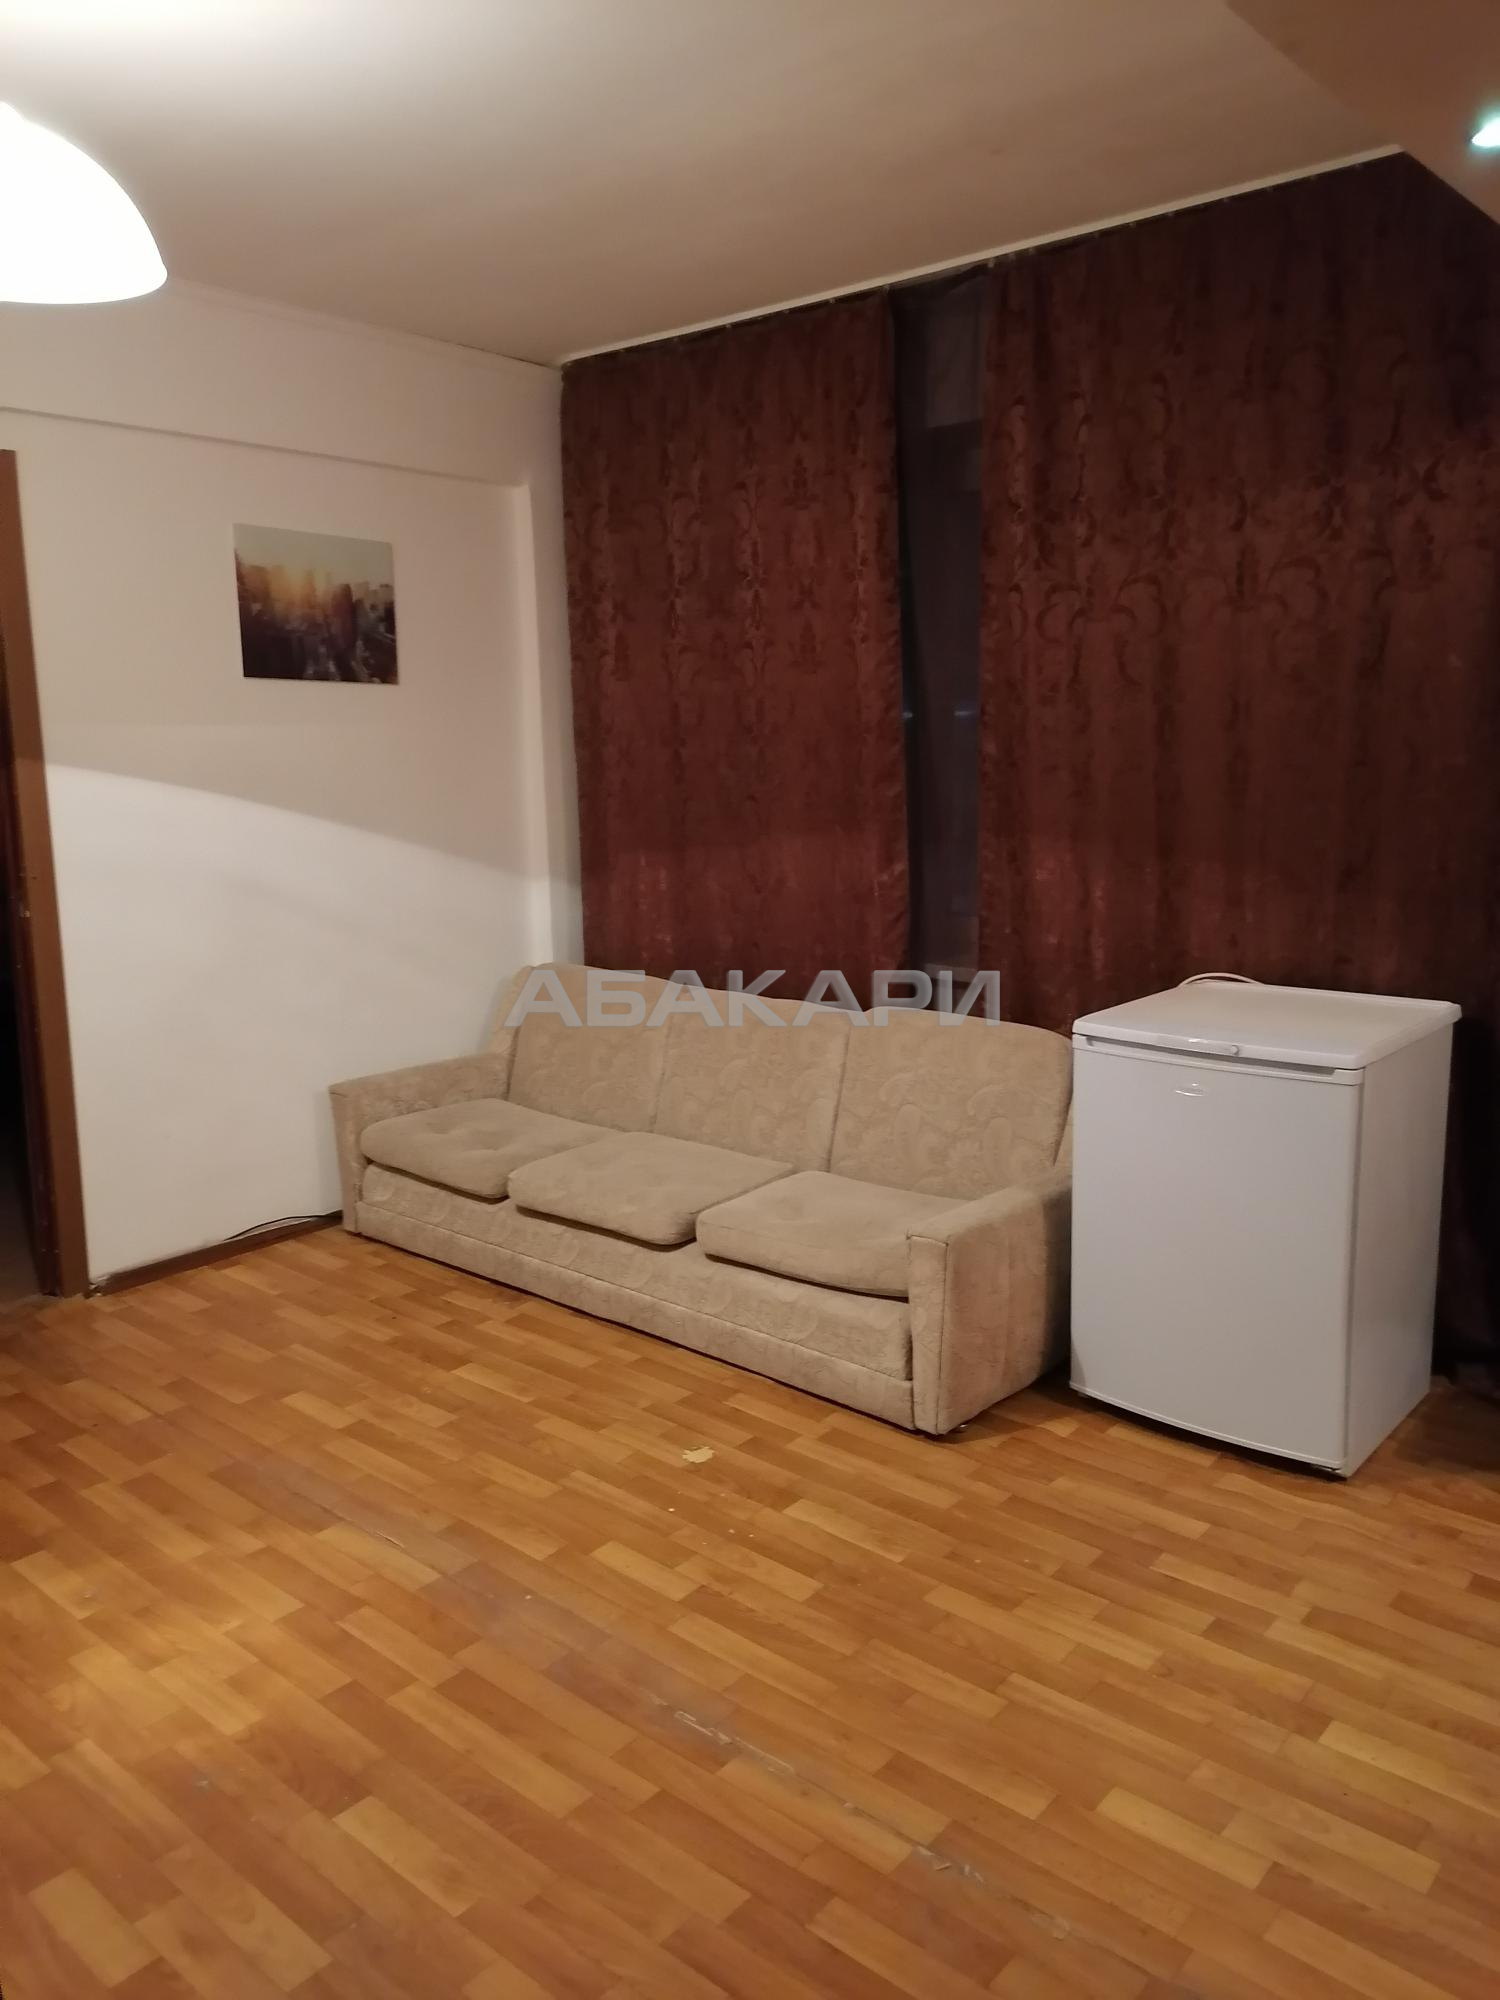 2к квартира улица Воронова, 14В 2/5 - 40кв   17000   аренда в Красноярске фото 15